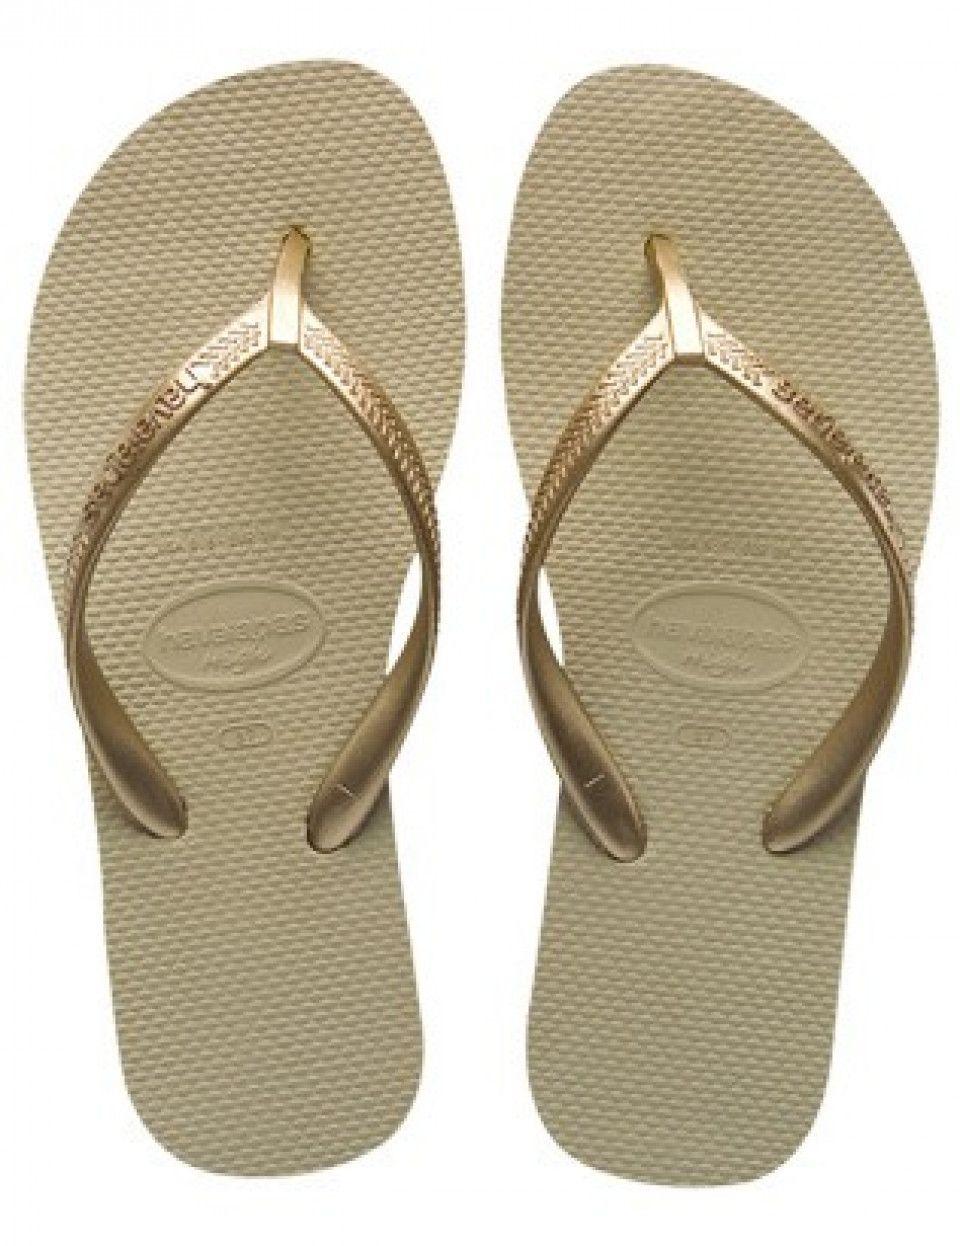 259e85fbc1bd46 Havaianas High Light Sand Grey Light Golden Flip Flop Price From  £22.01